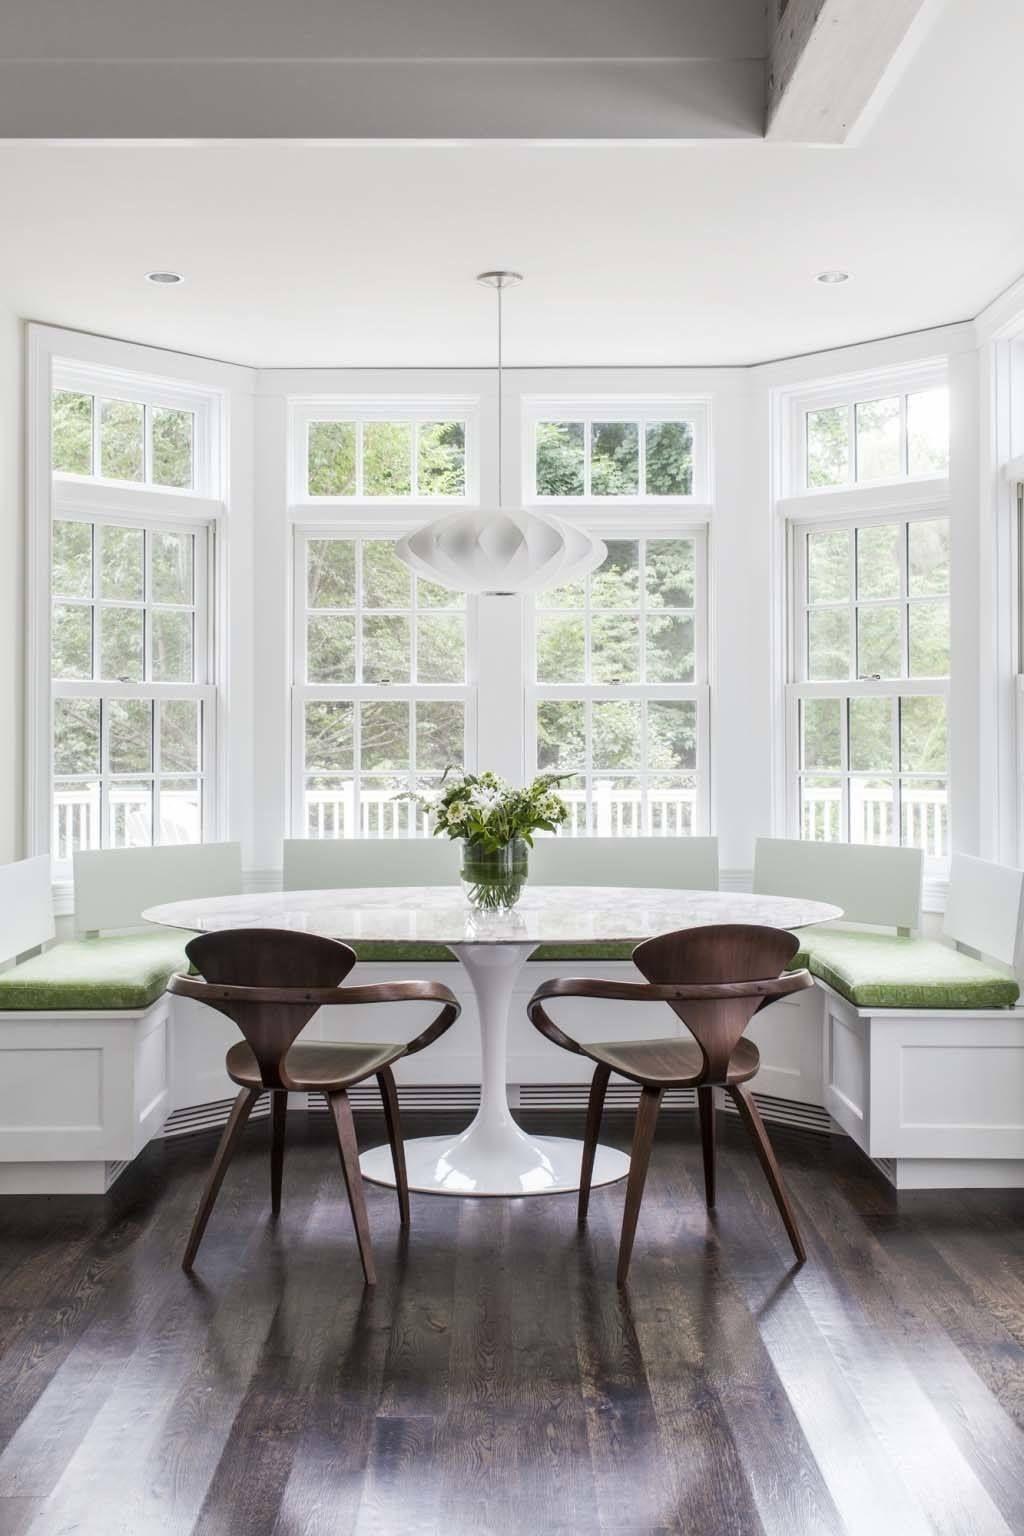 Luminous Update To Massachusetts Home Encourages Family Intimacy Gorgeous Kitchen Design Massachusetts Design Ideas